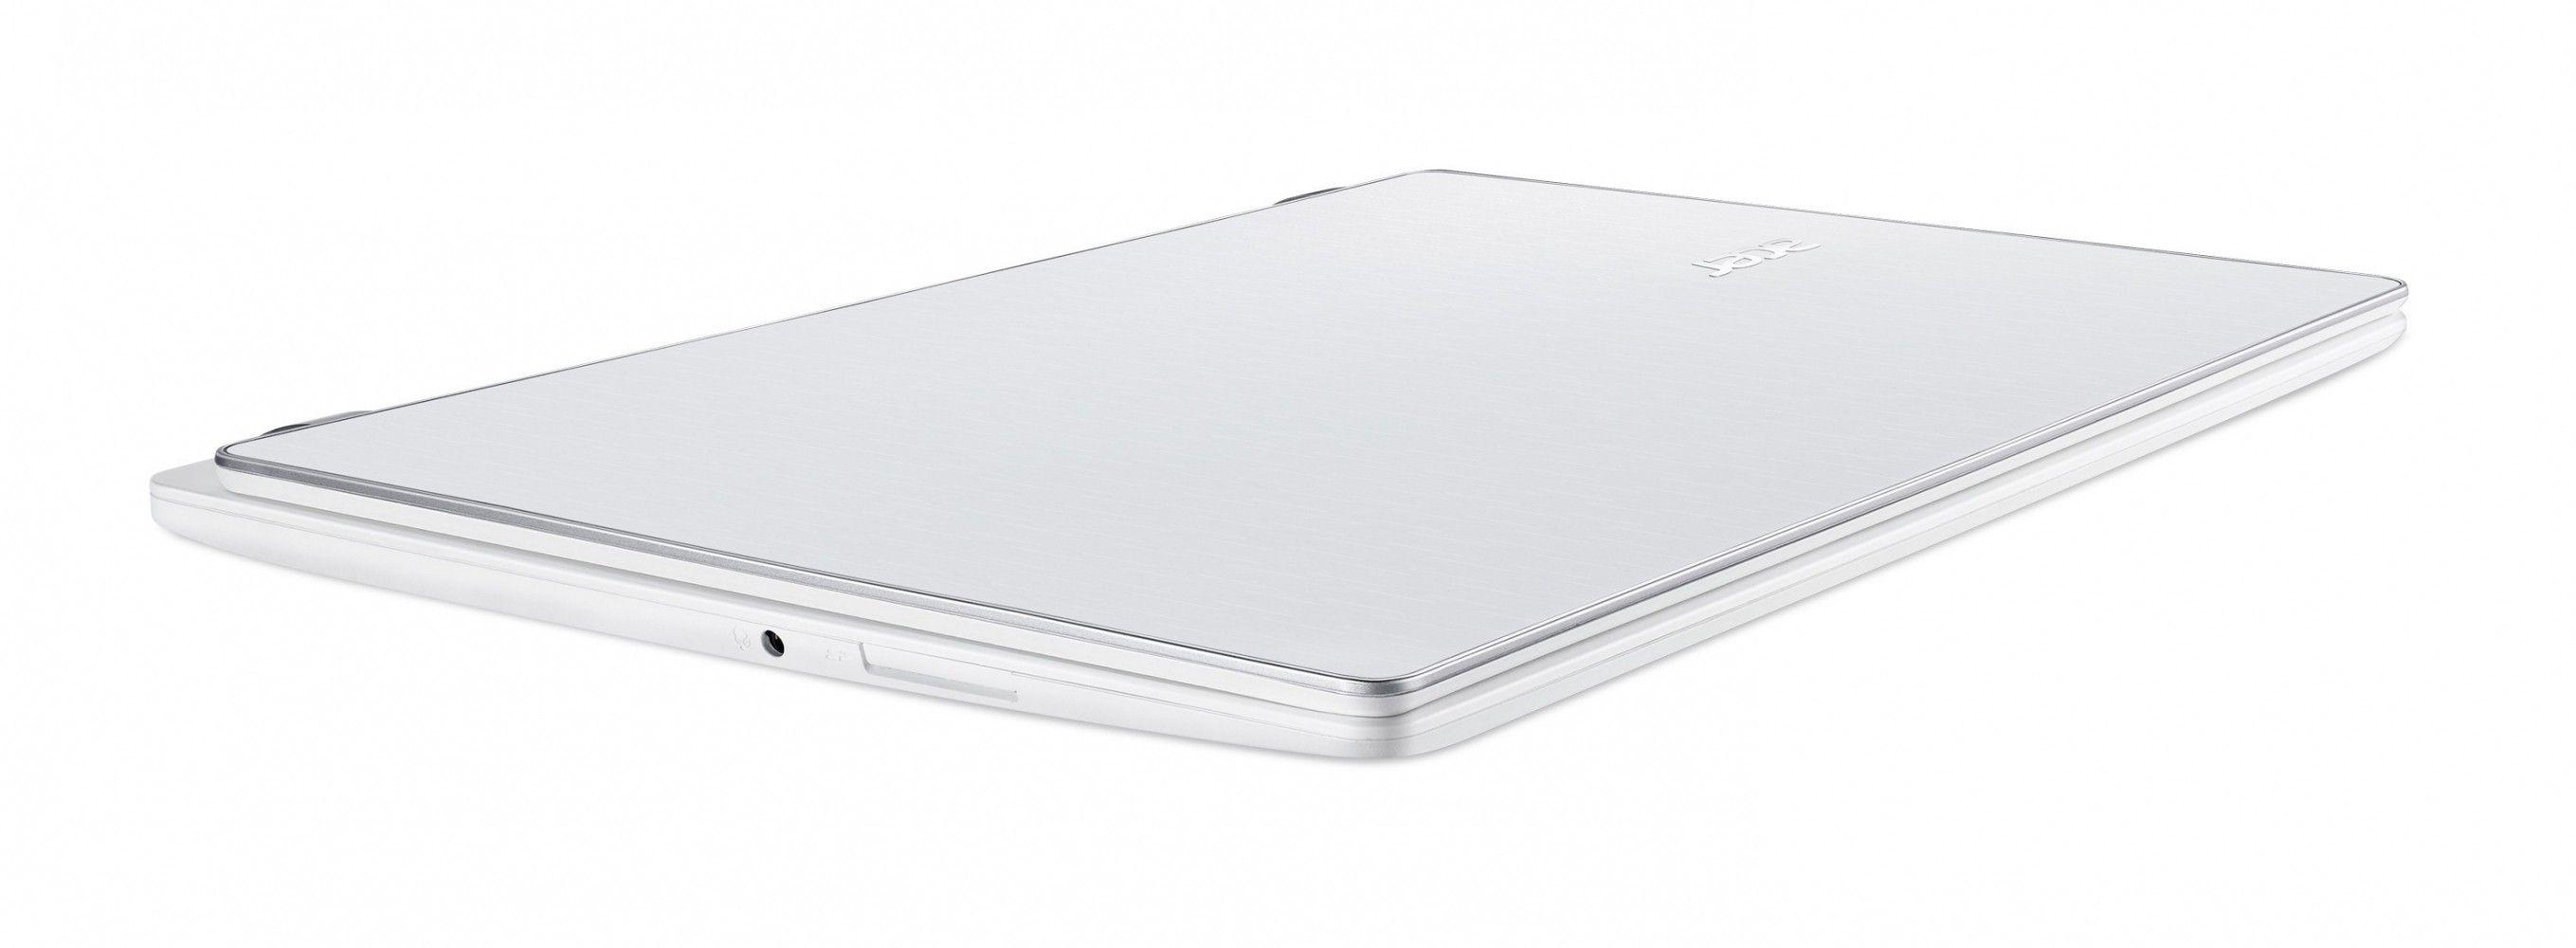 Ноутбук ACER Aspire V3-371-527T (NX.MPFEU.092) White - 2